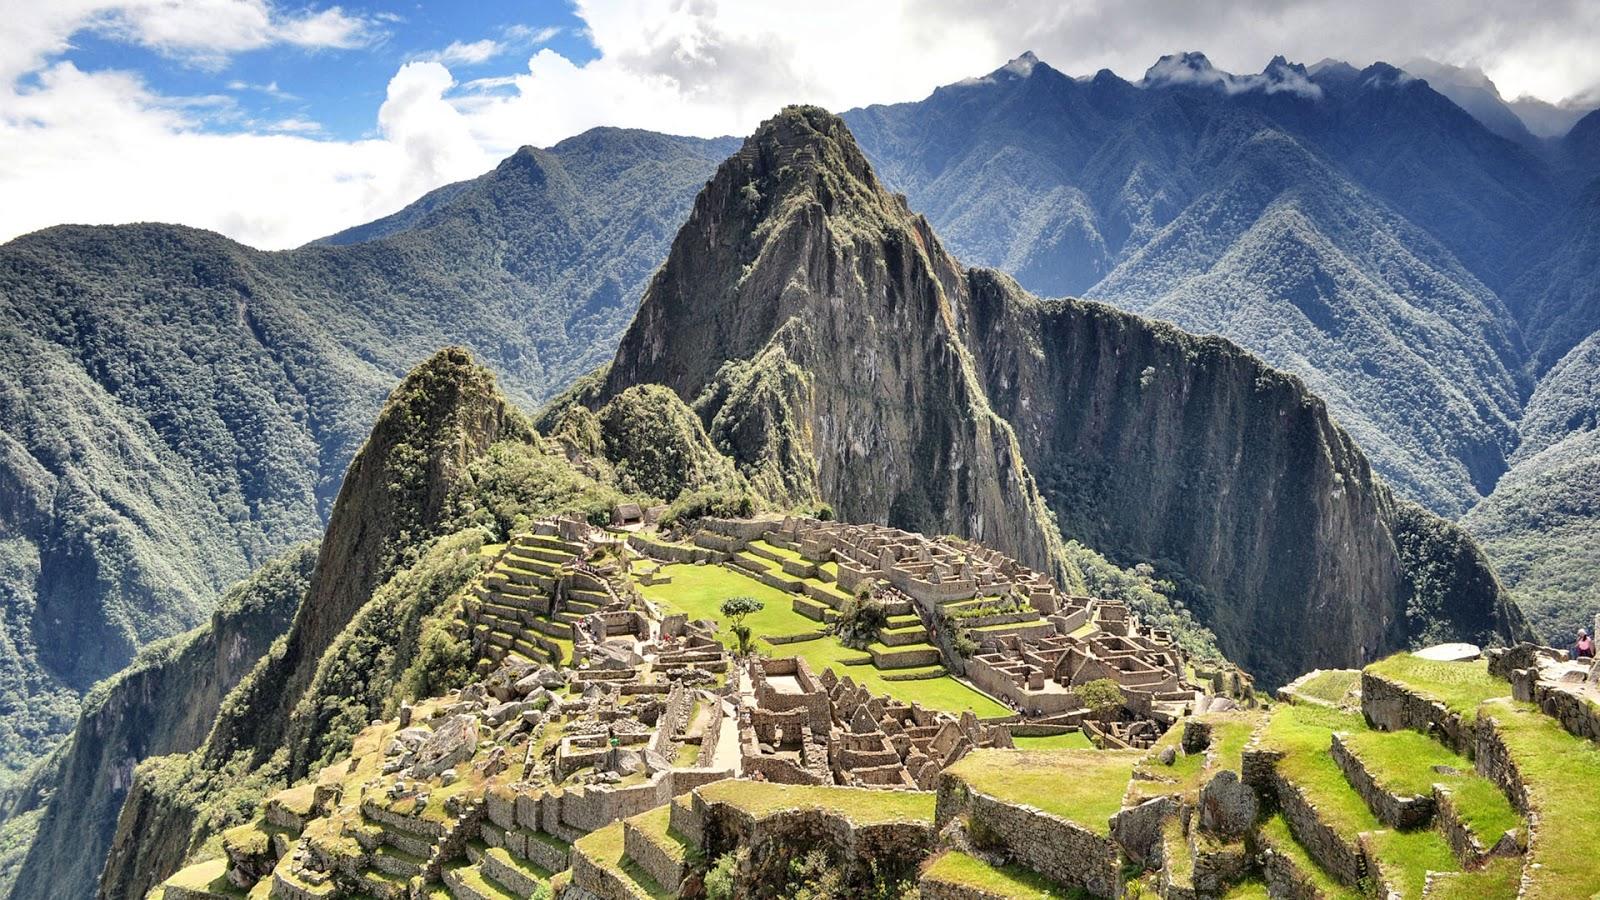 Machu Picchu, Peru | HD Wallpapers (High Definition) | Free Background